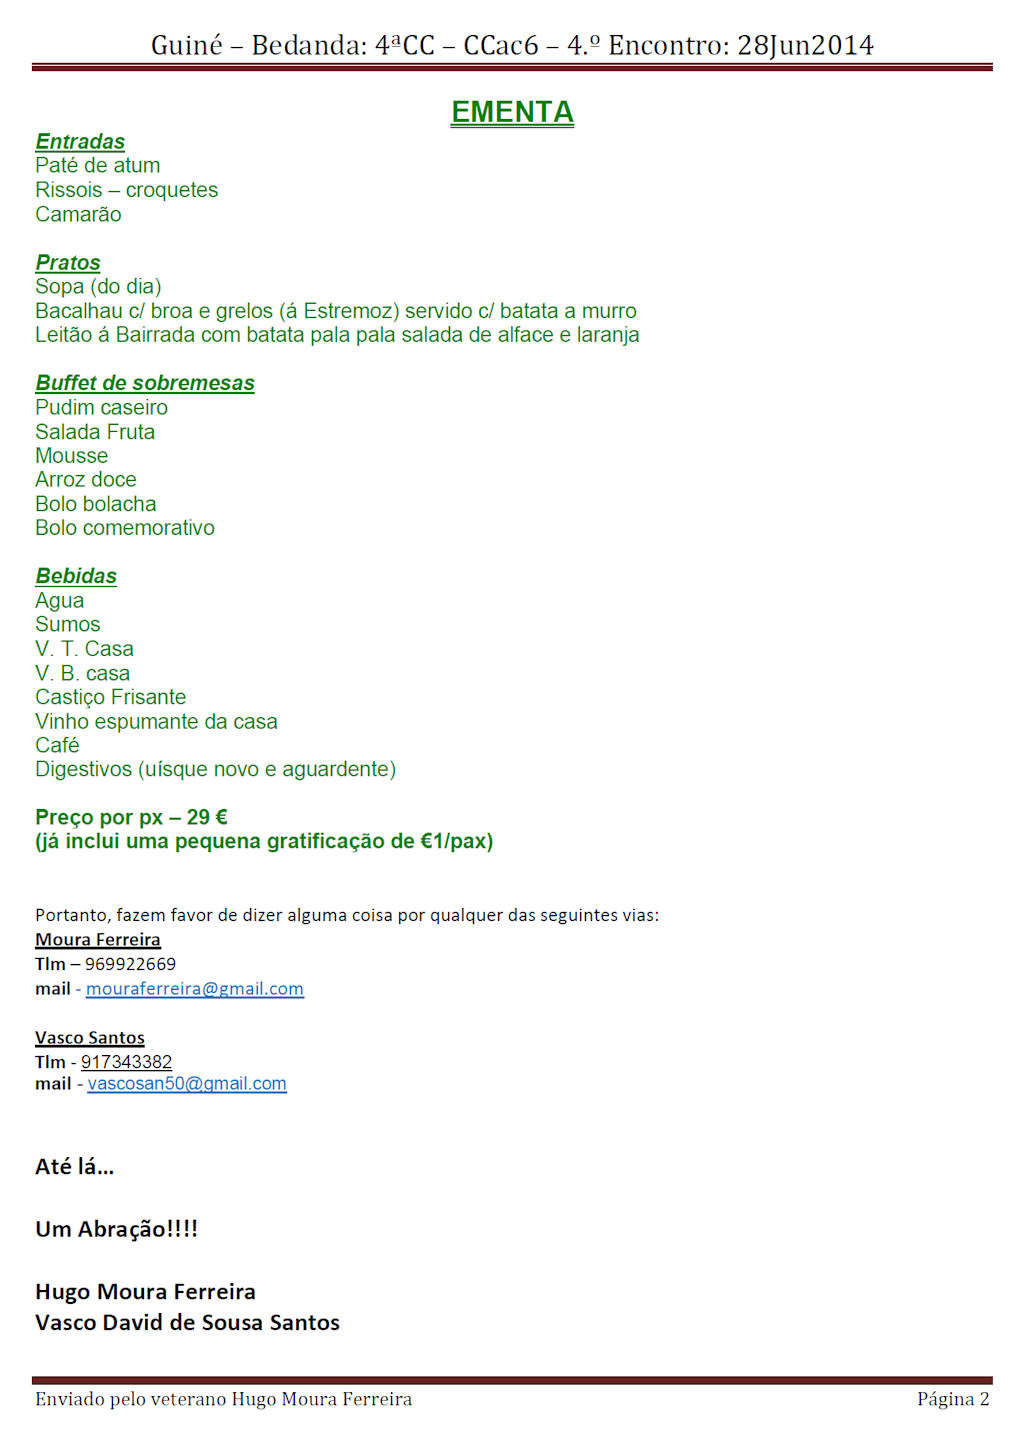 28Jun2014: Guiné – Bedanda: 4ªCC – CCac6 – 4.º Encontro - Mealhada Comuni11